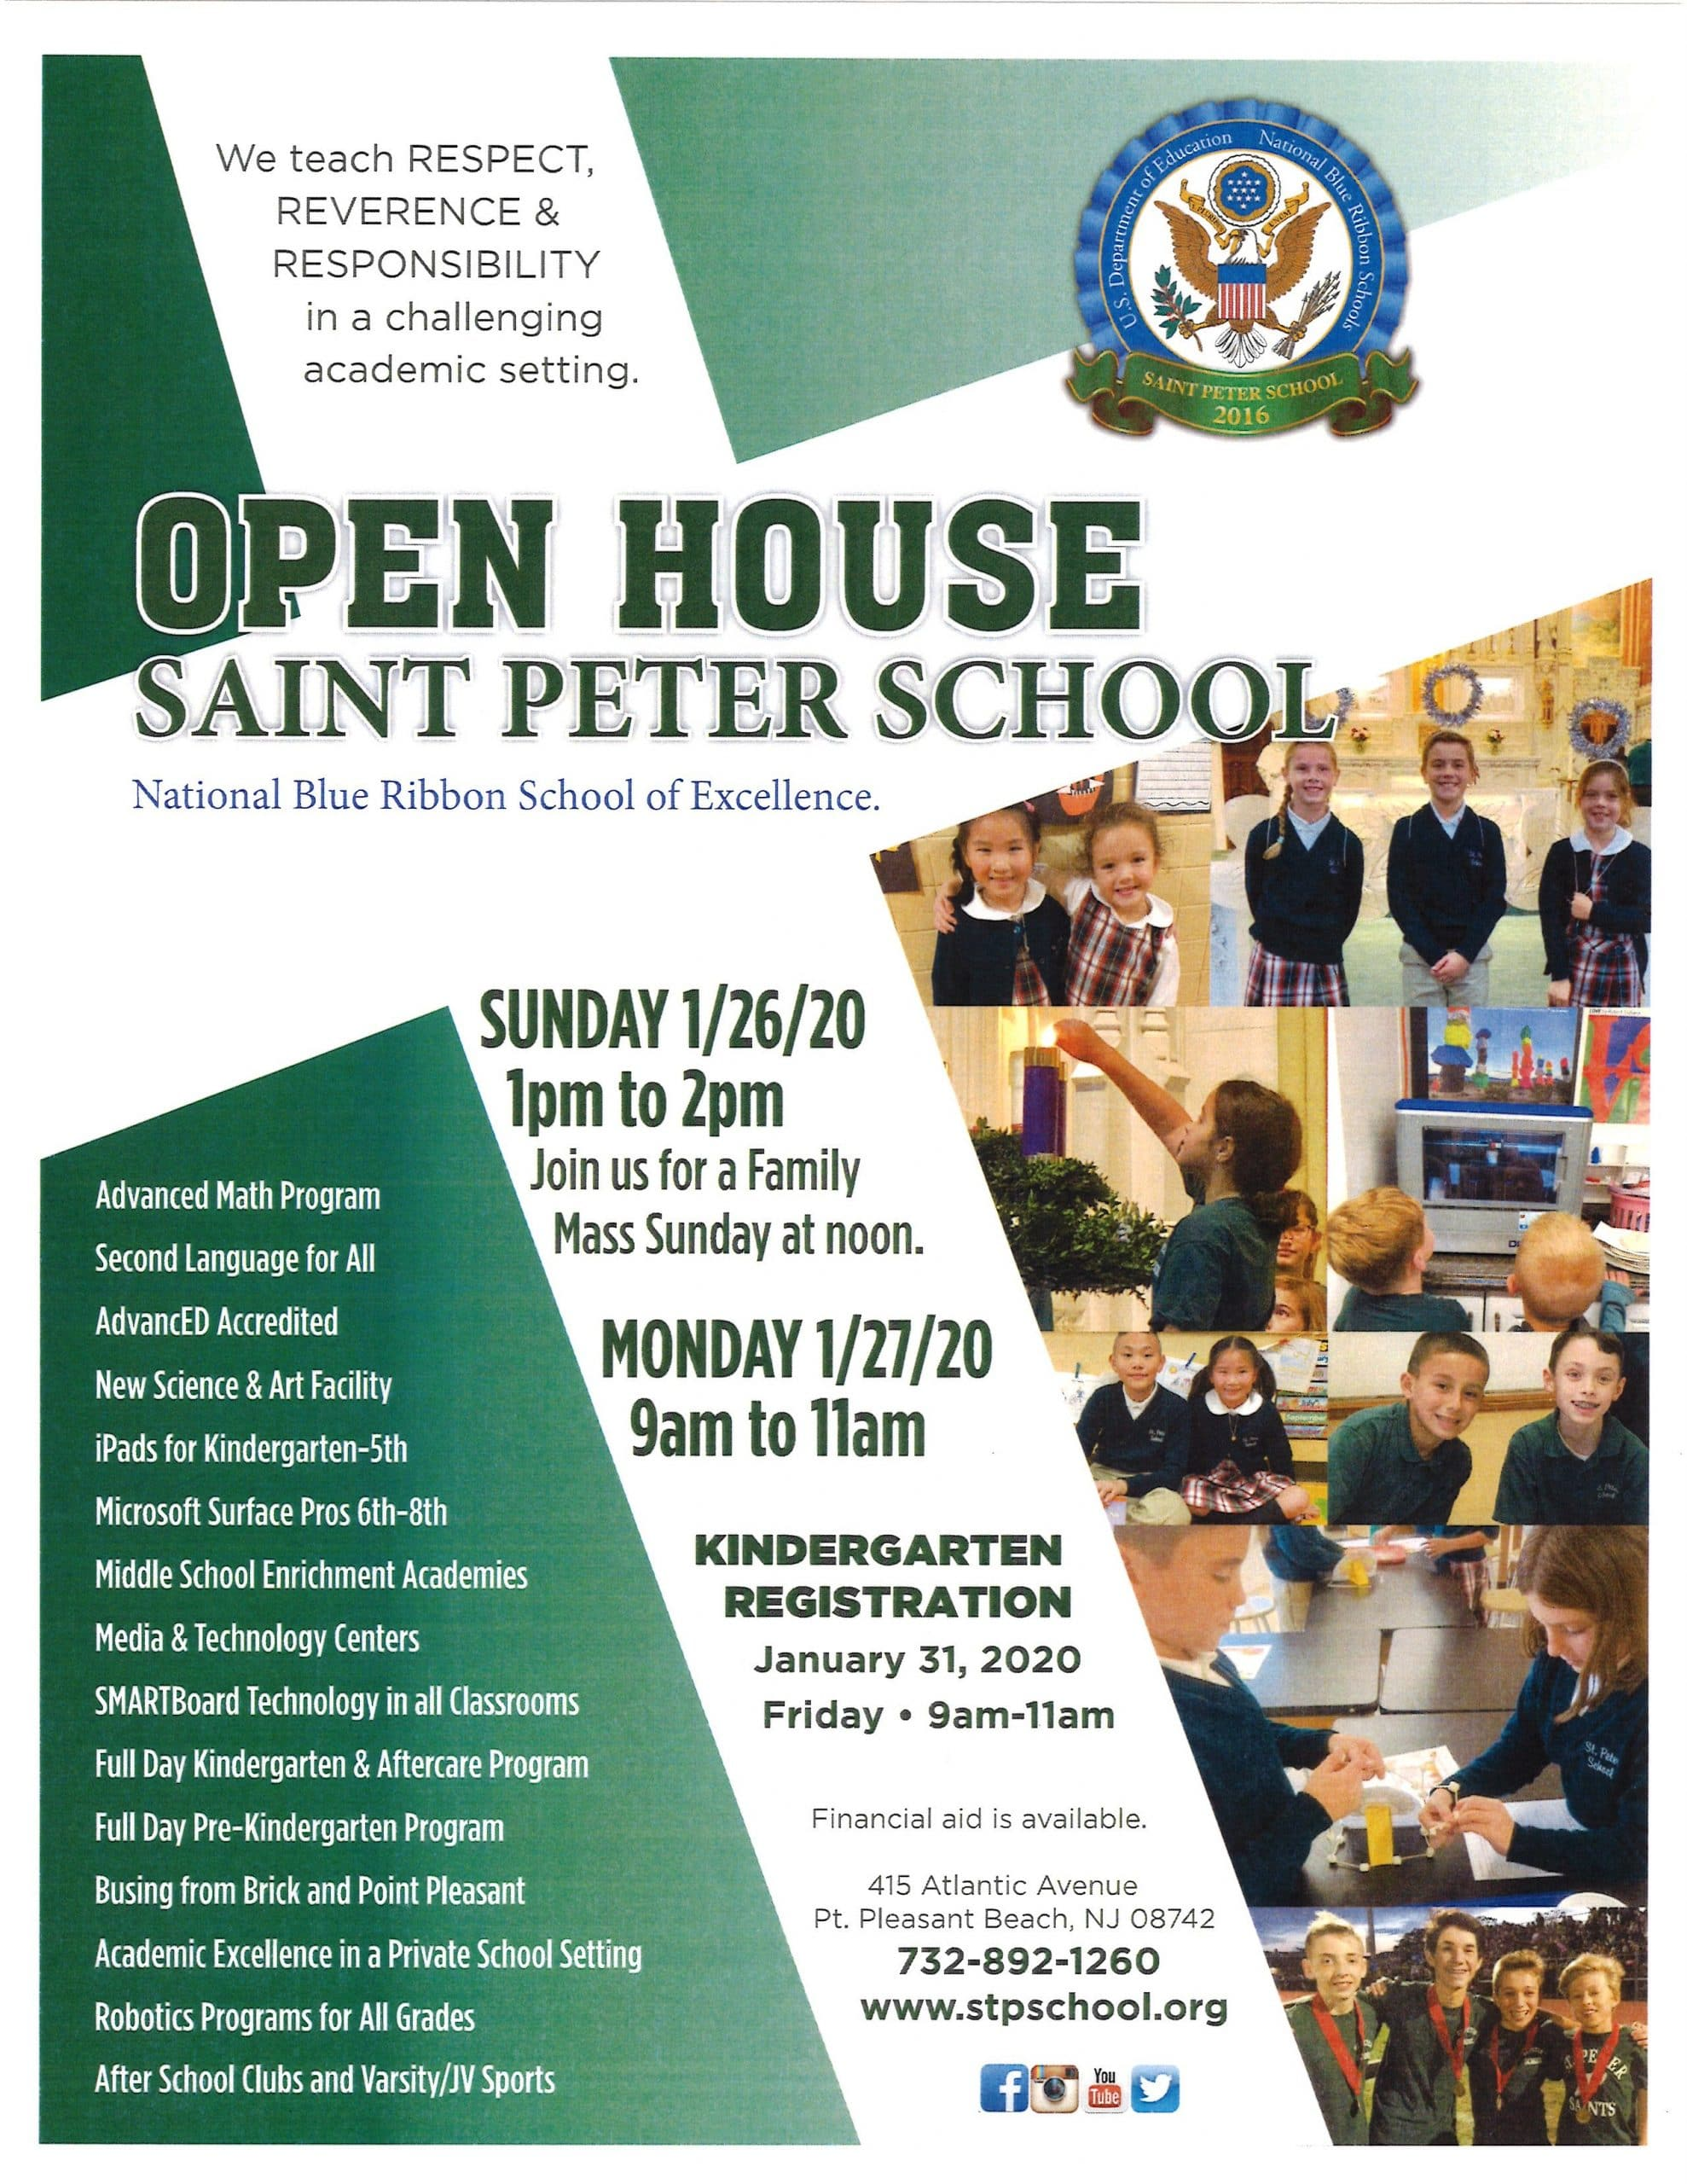 Saint Peter School Open House 2020